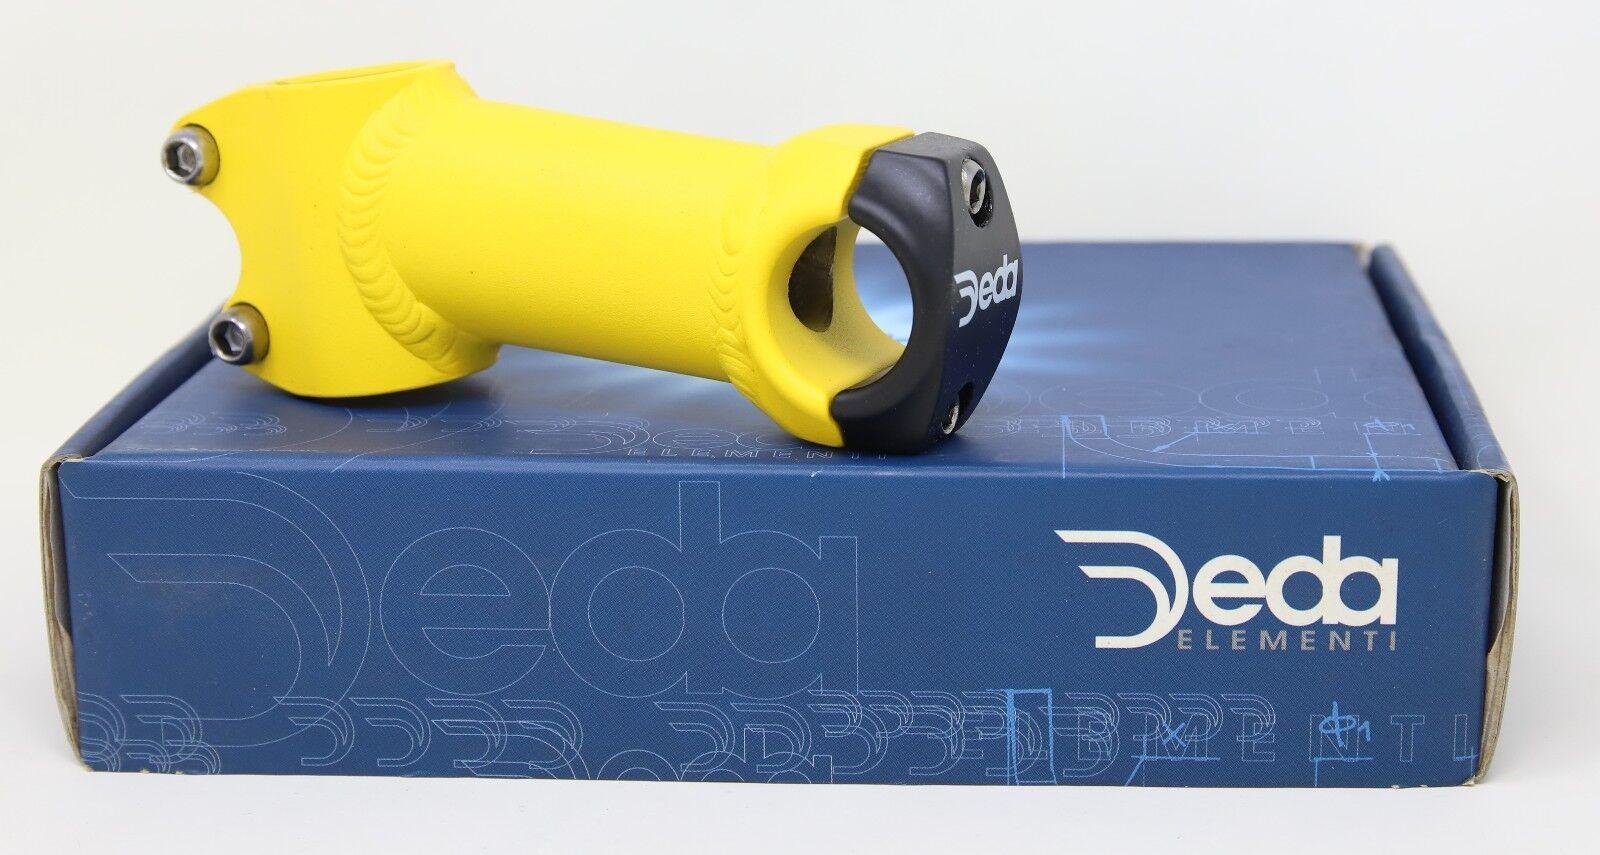 DEDA ELEMENTI LYNX AHEAD A-HEAD STEM - 90MM  1   CLAMP 26 - YELLOW - NOS NIB  order now lowest prices